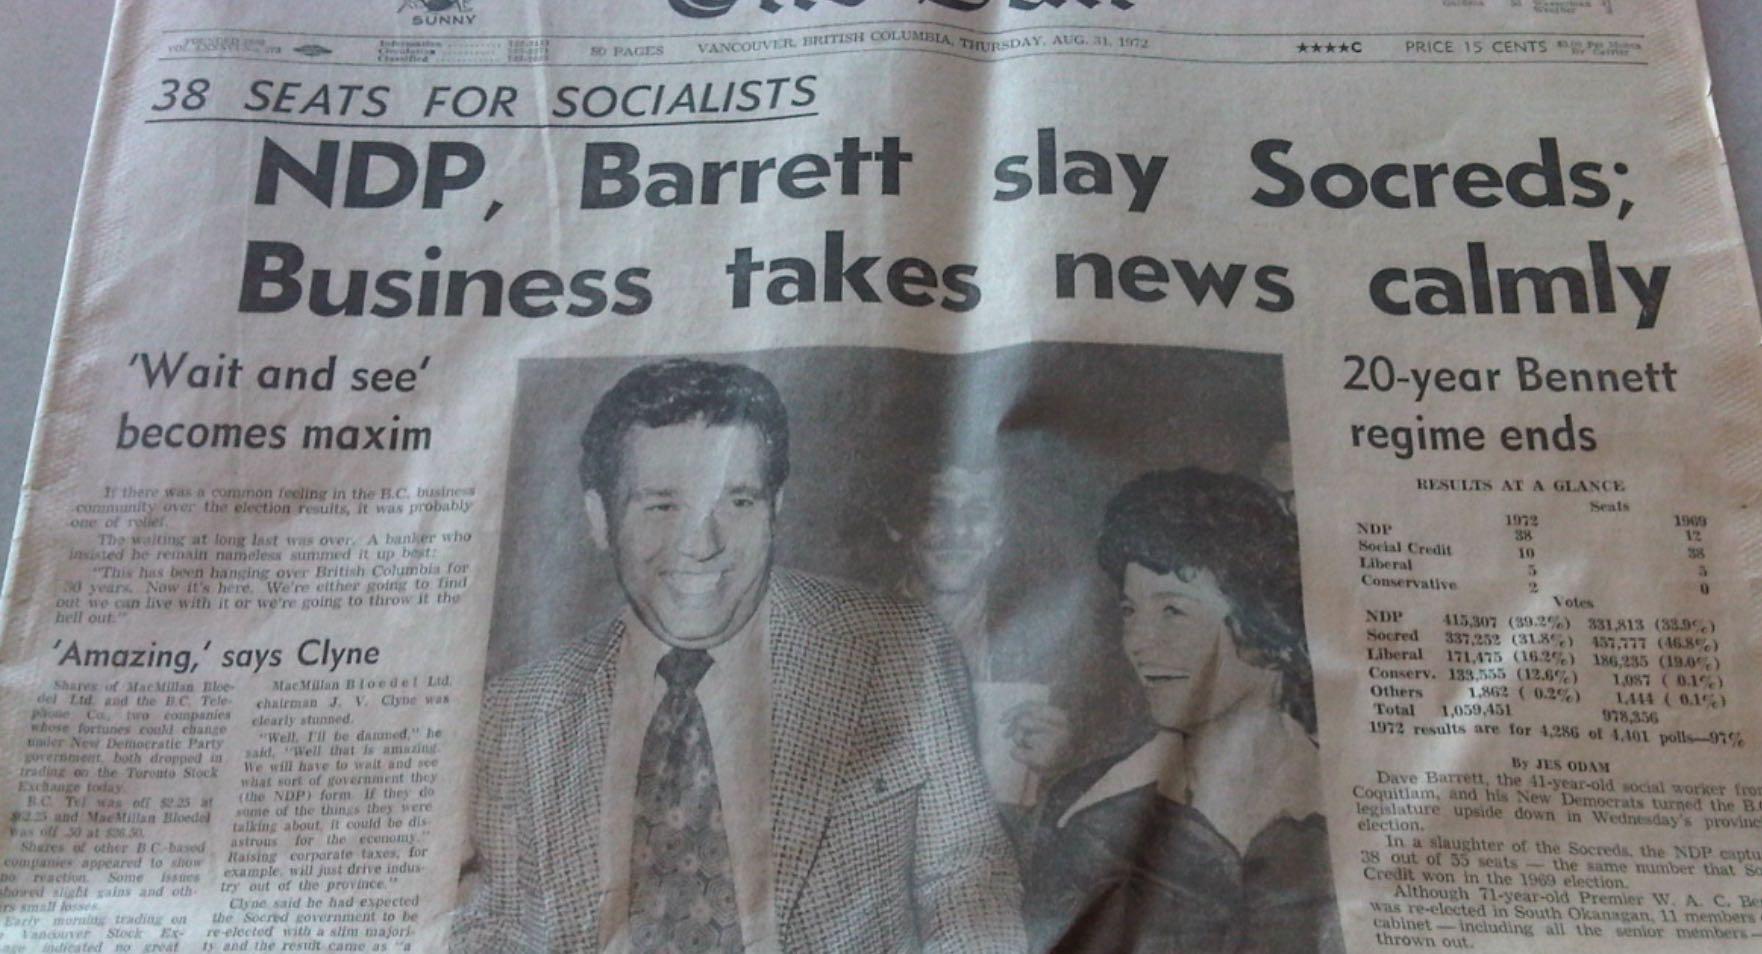 Barrett NDP BC Politics Vancouver Sun